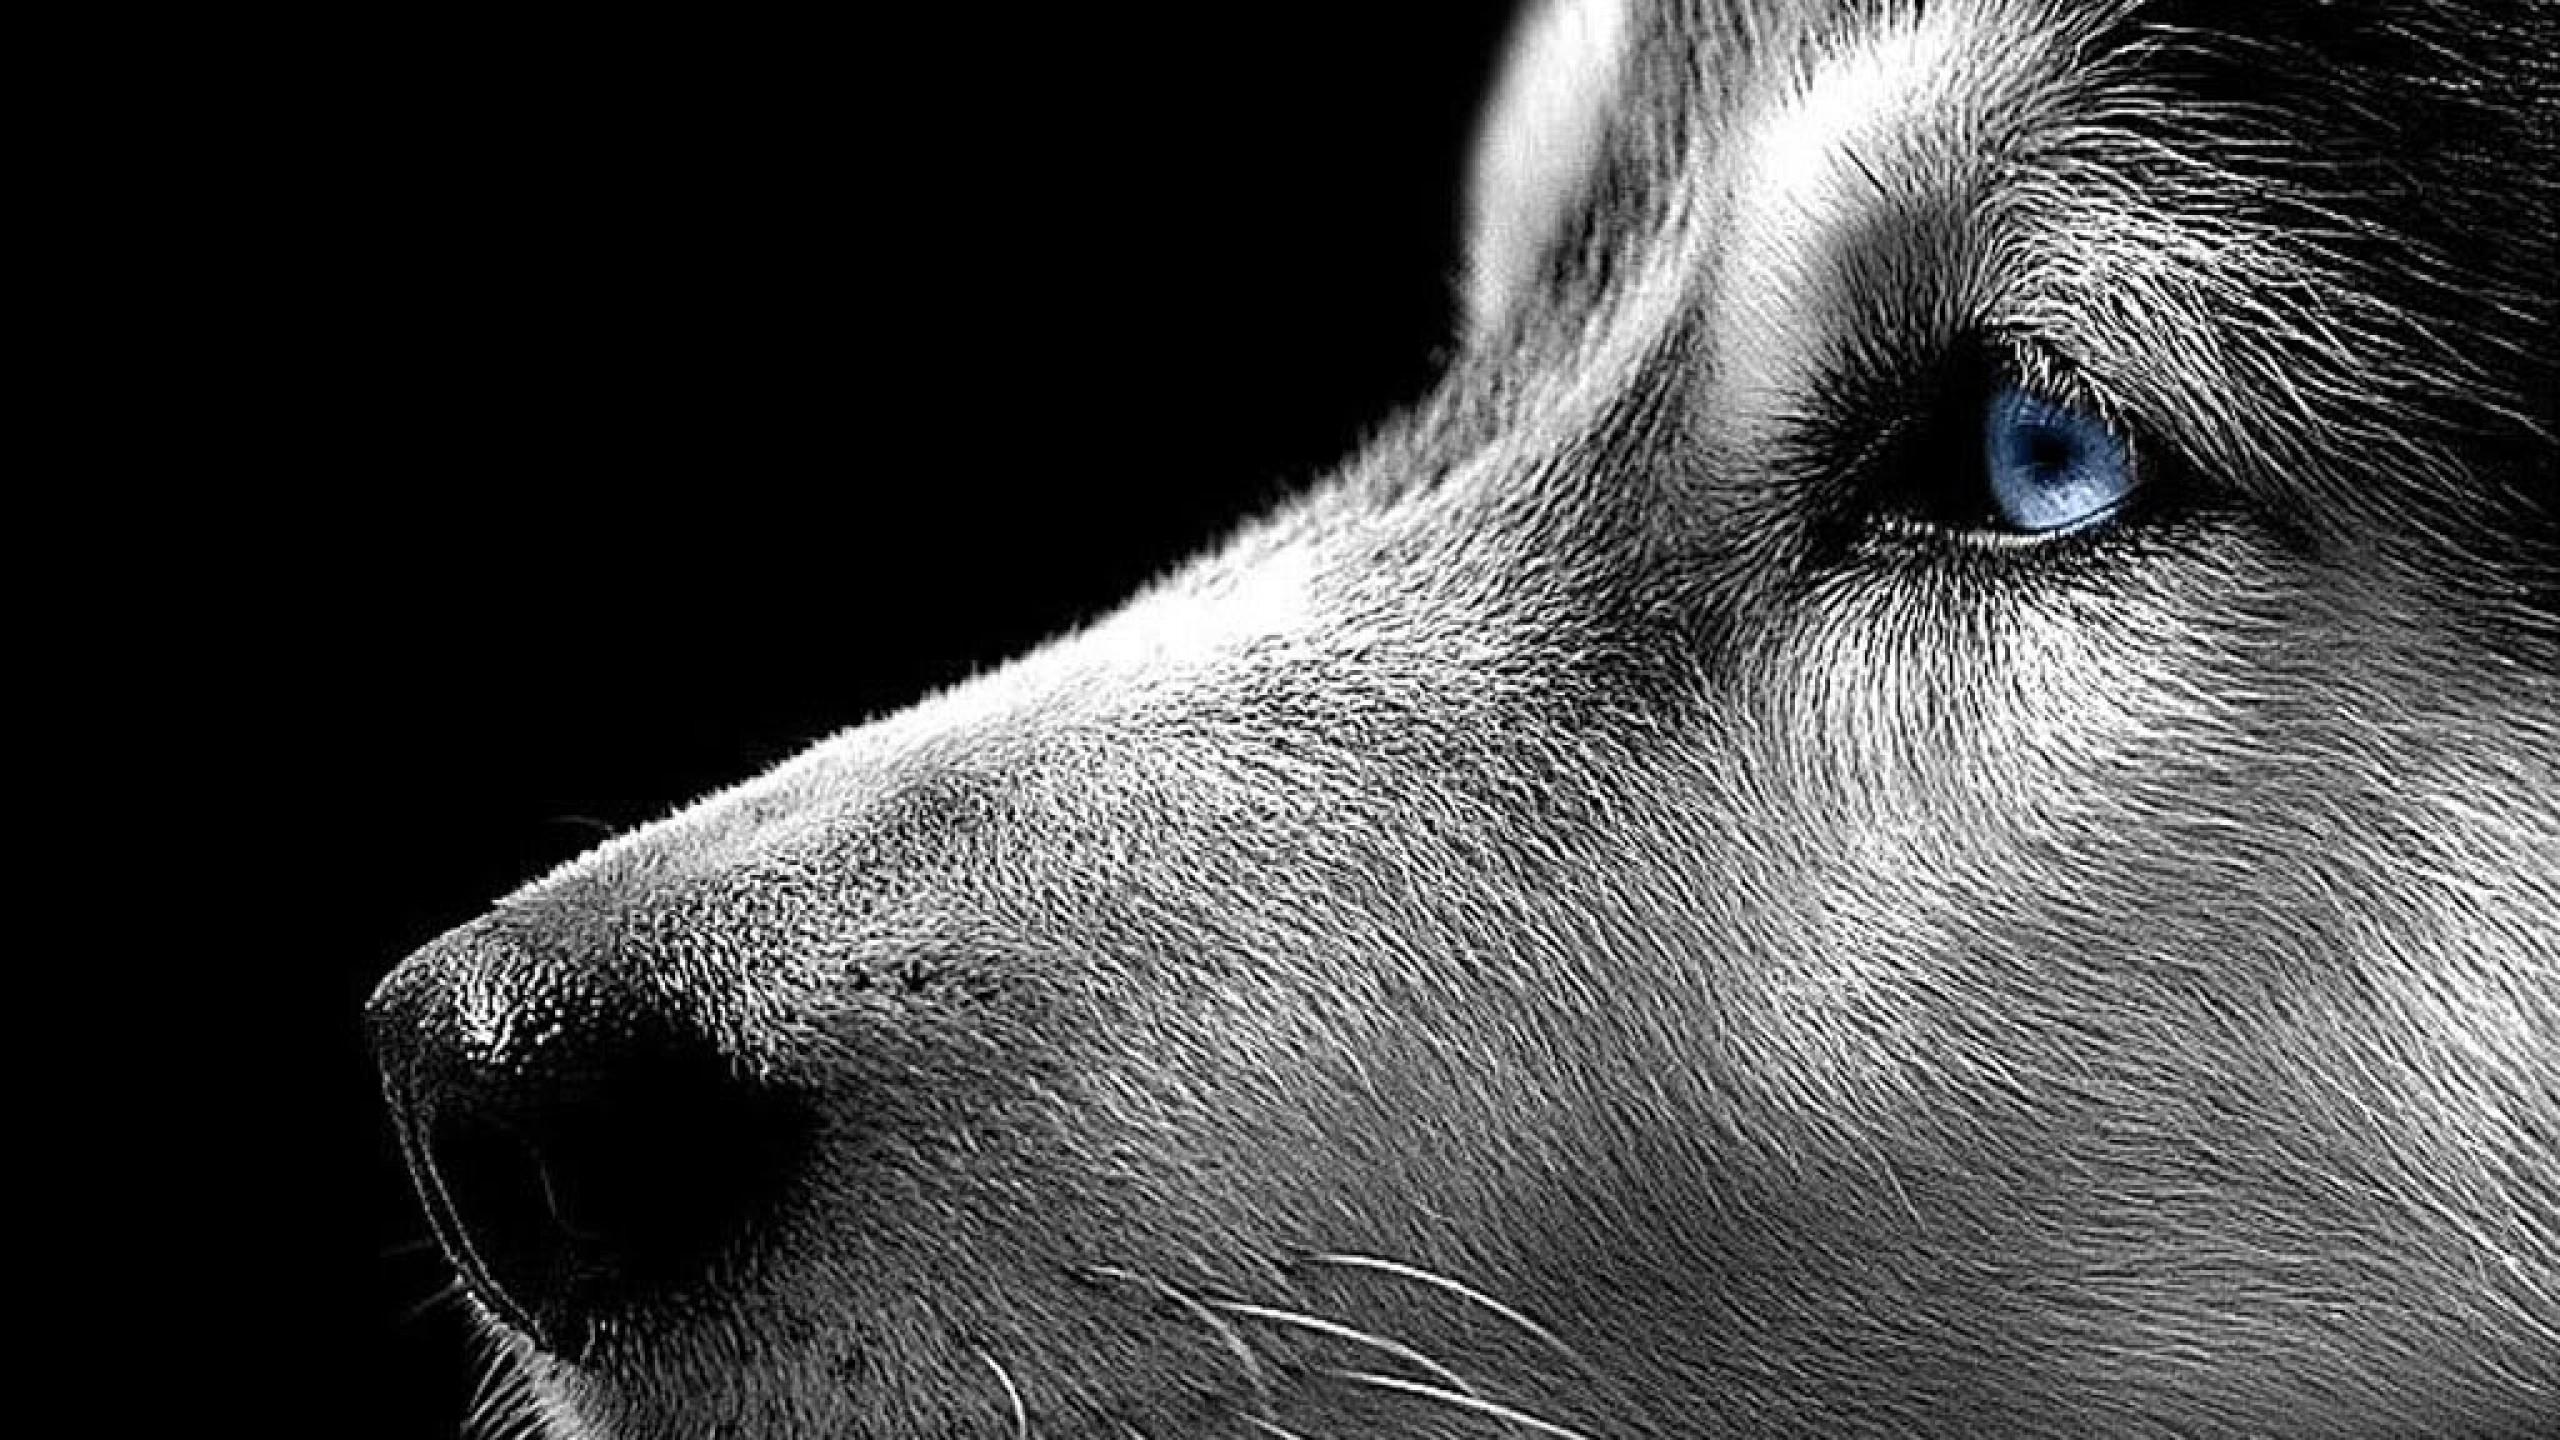 pictures of huskies husky hd wallpapers movie hd wallpapers huskies pictures of